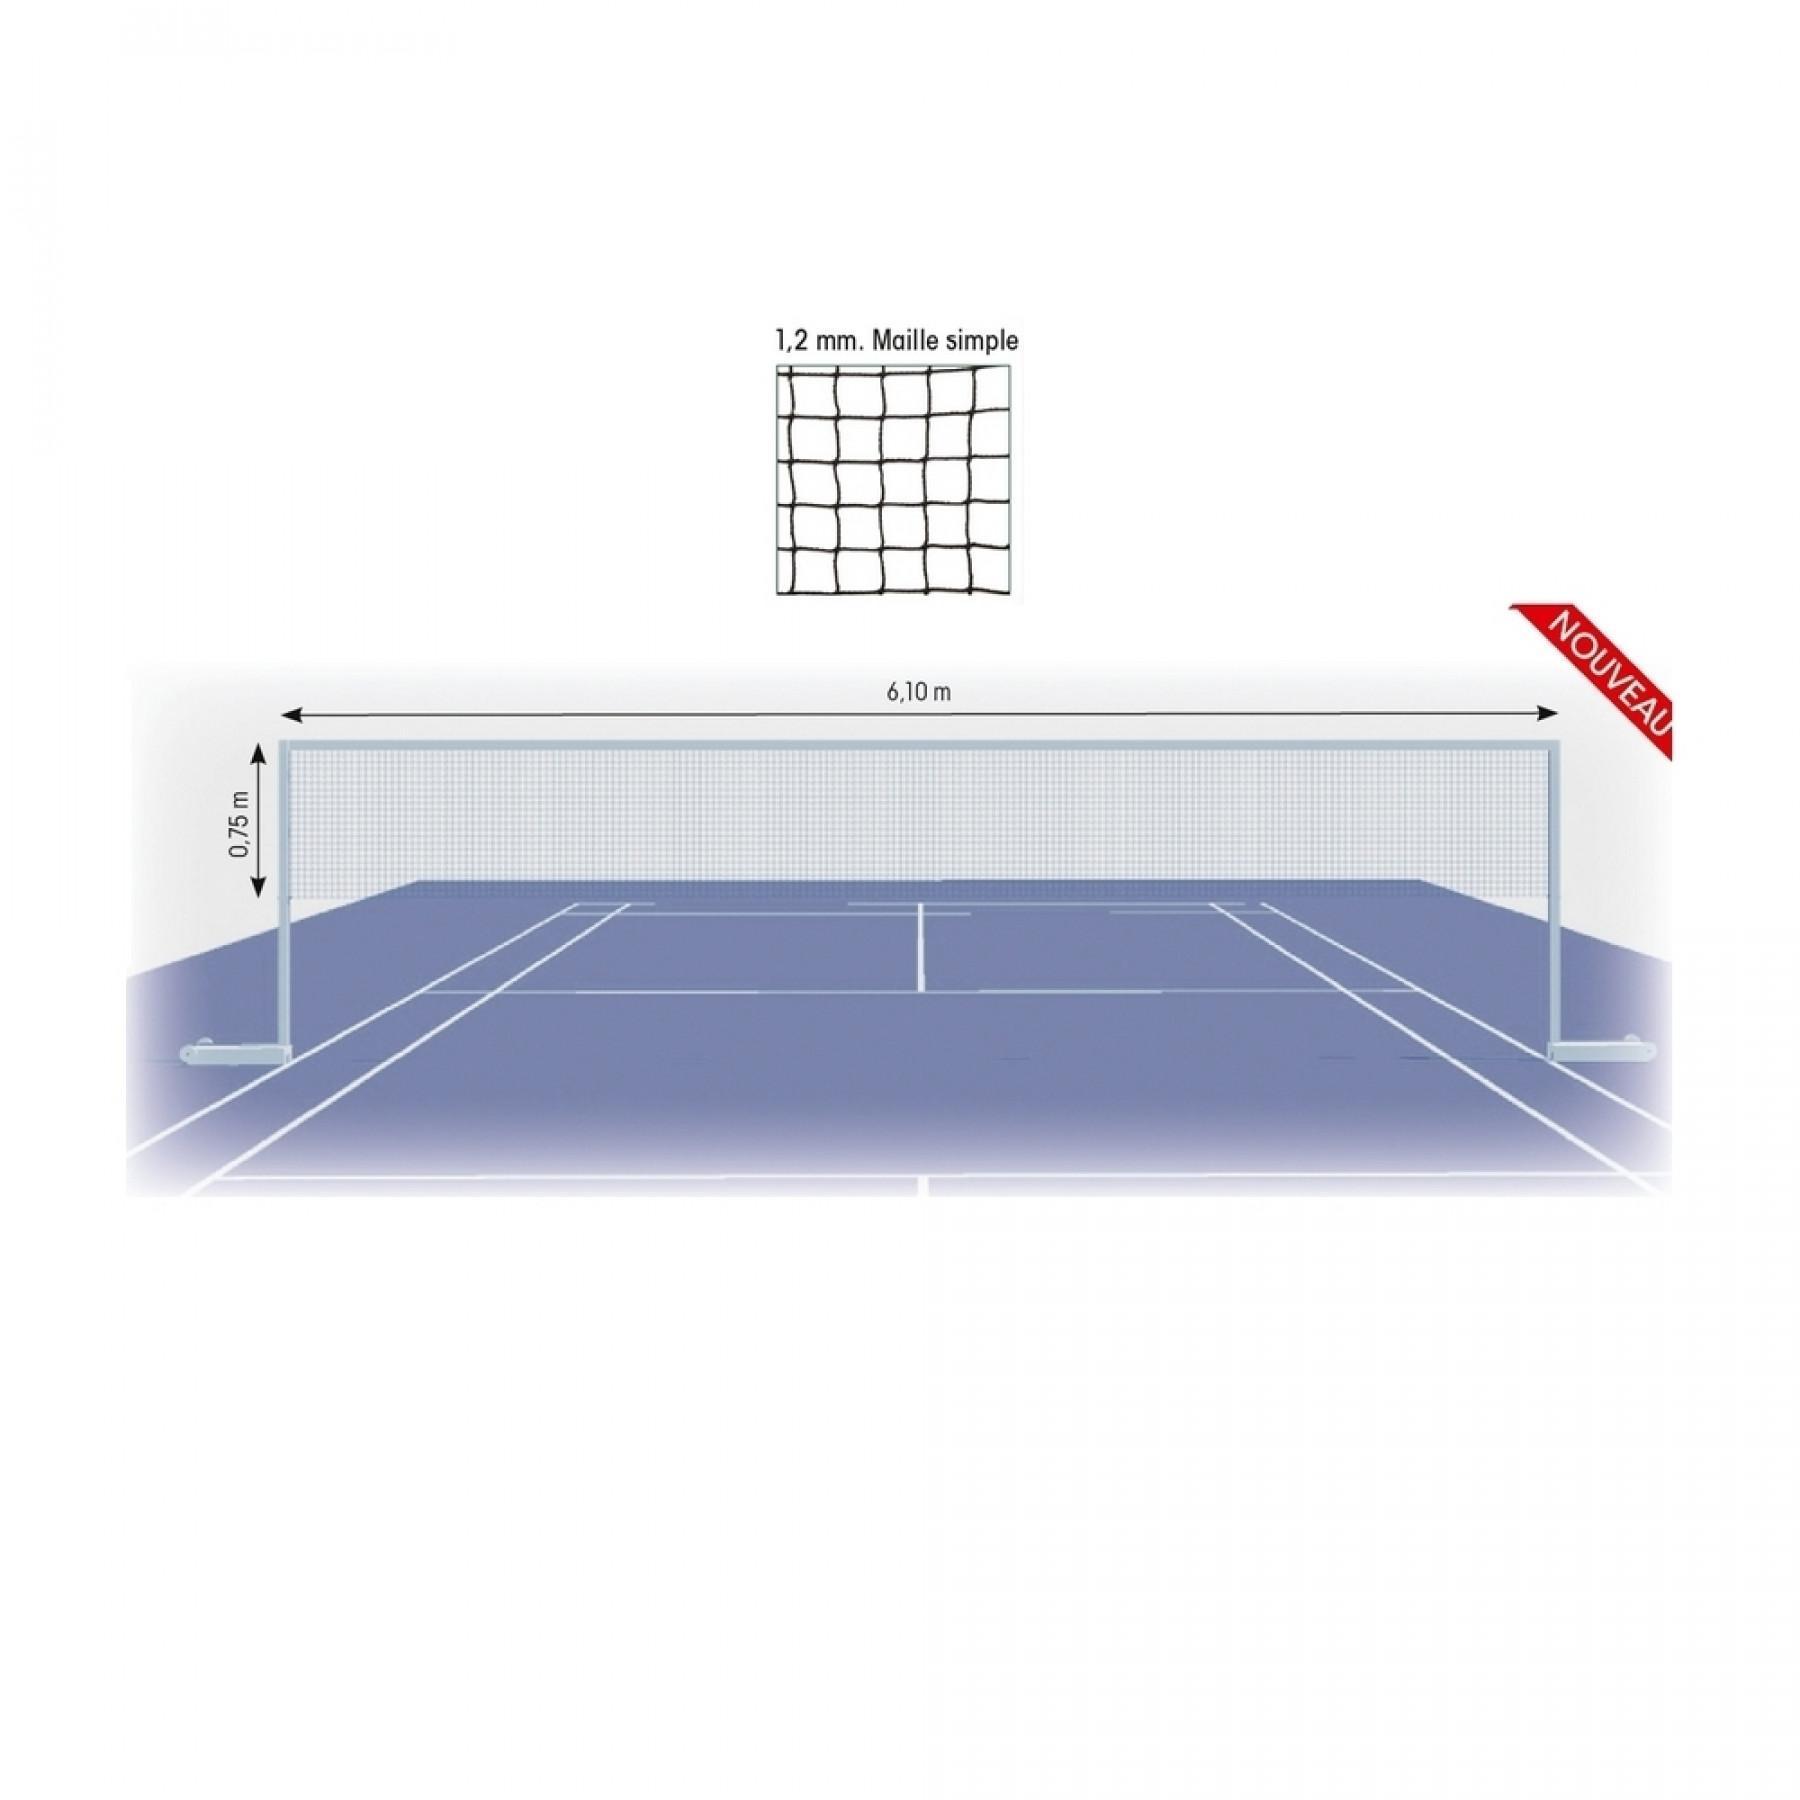 Badminton net 1.2 mm MS Tremblay